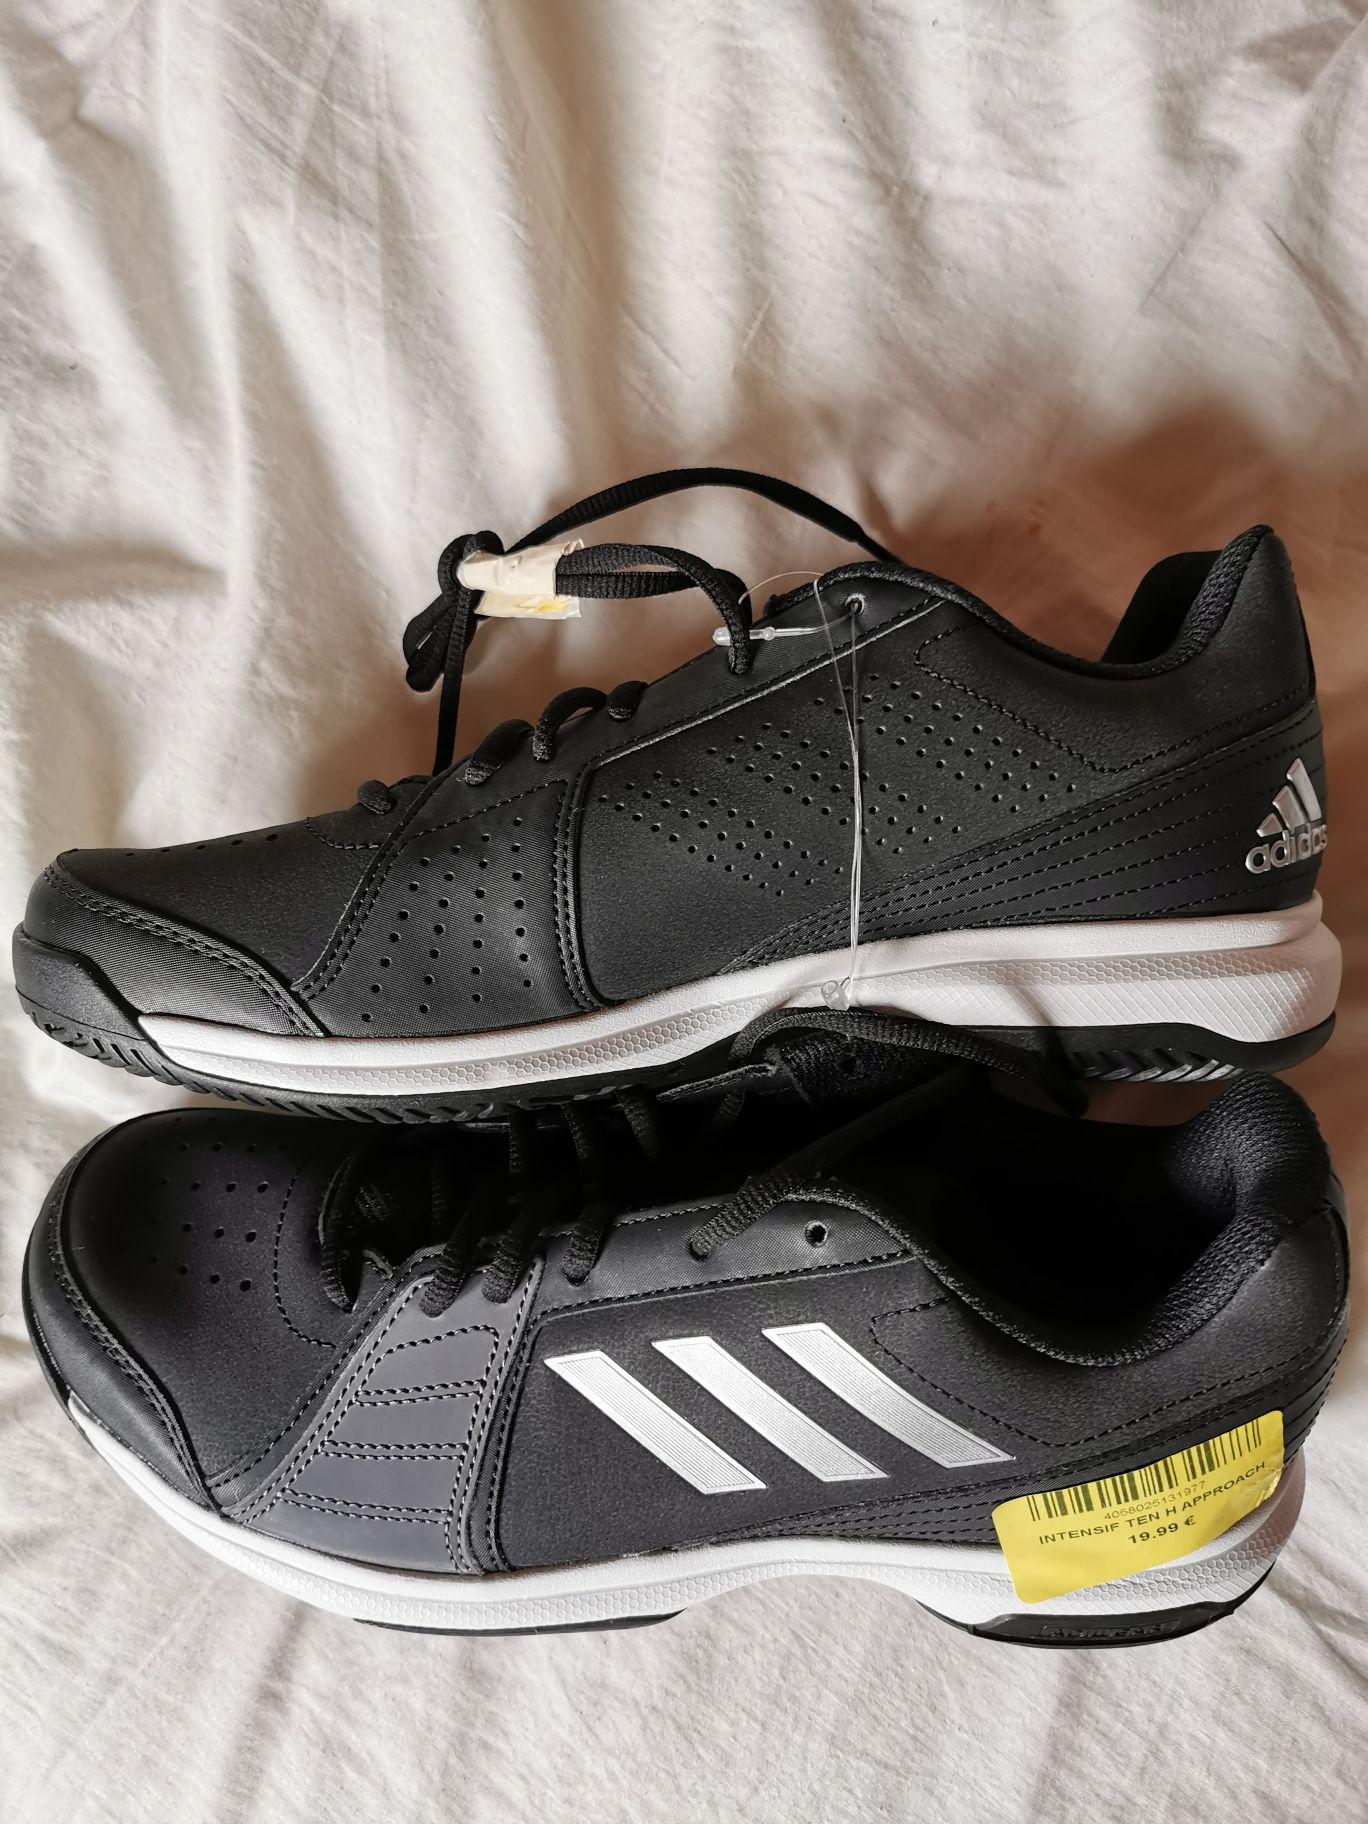 Baskets Adidas Approach - Noir (Plusieurs tailles) - Quiberon (56)